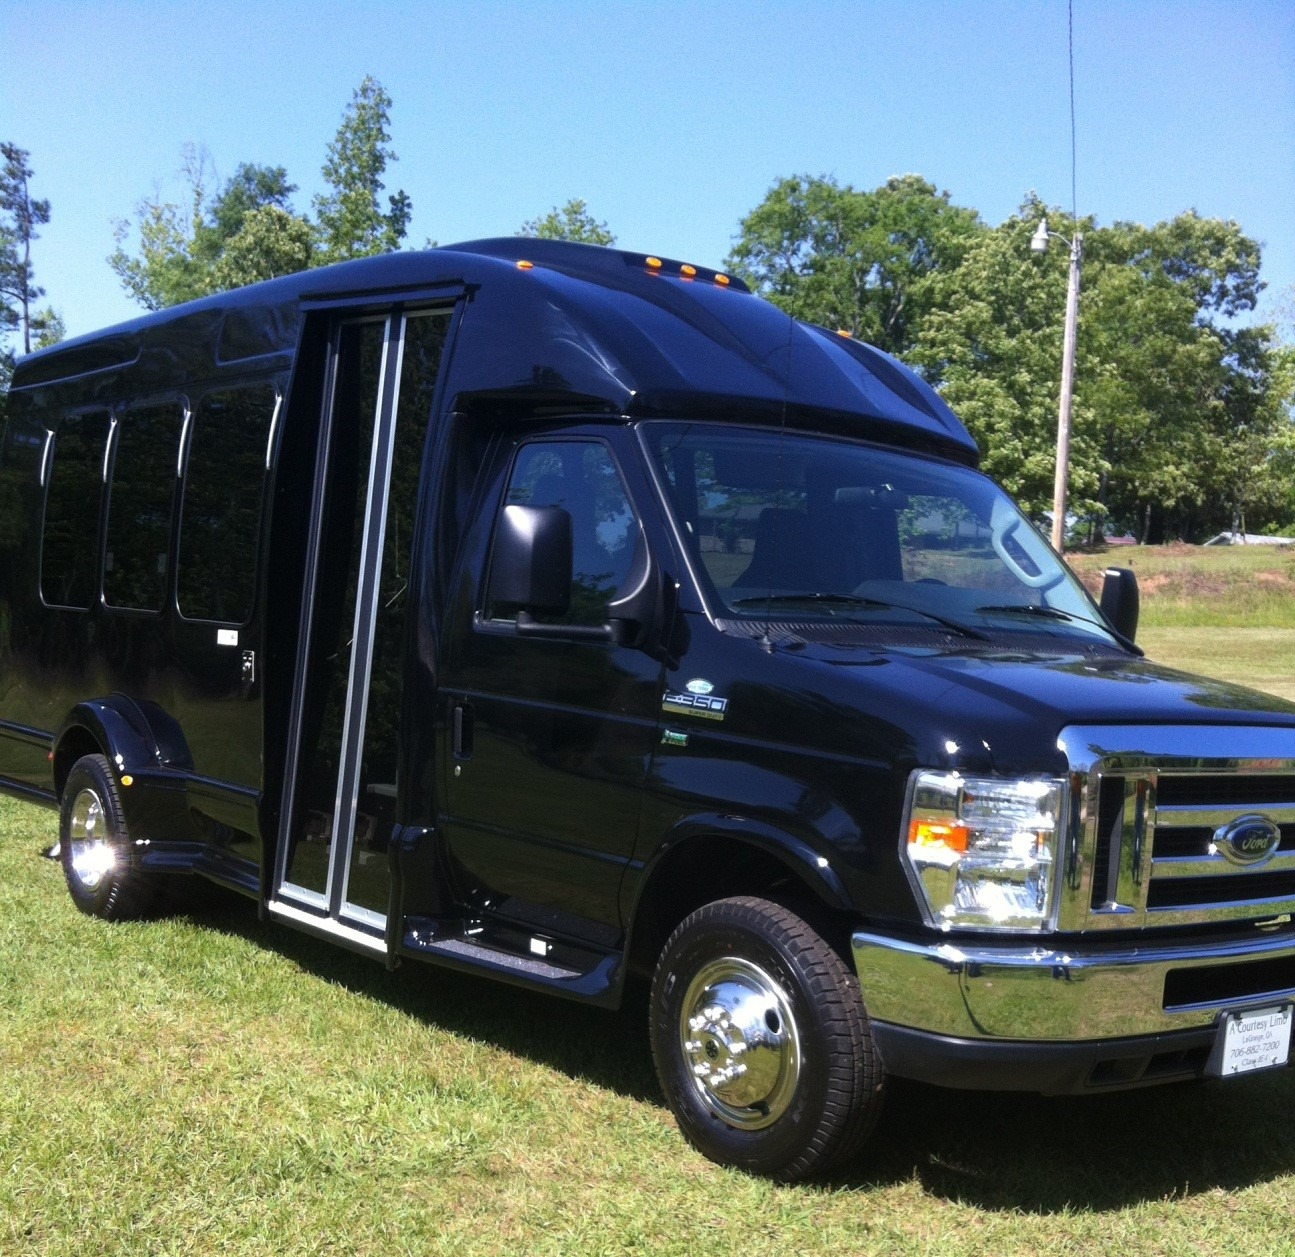 SUVs Sedans And Group Transportation